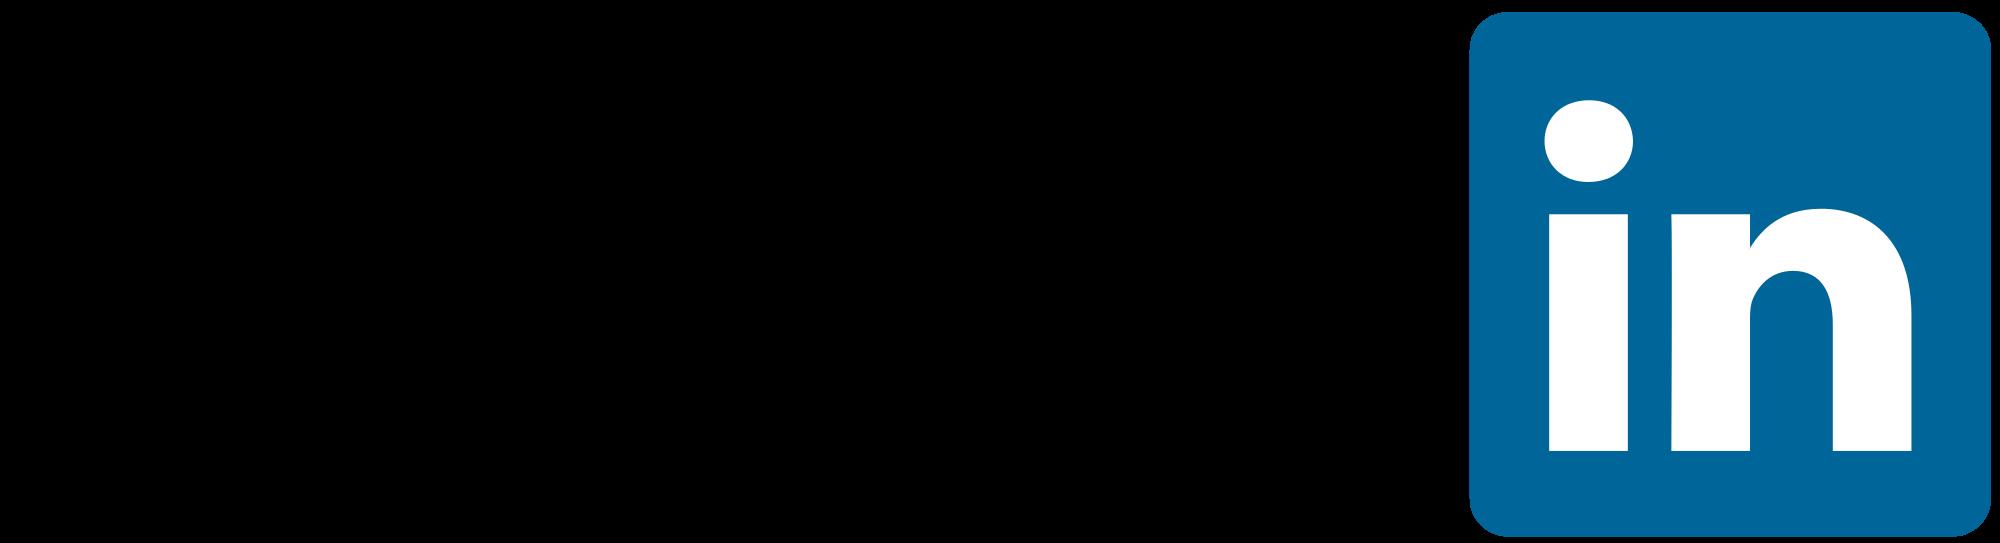 Linkedin PNG - 9364